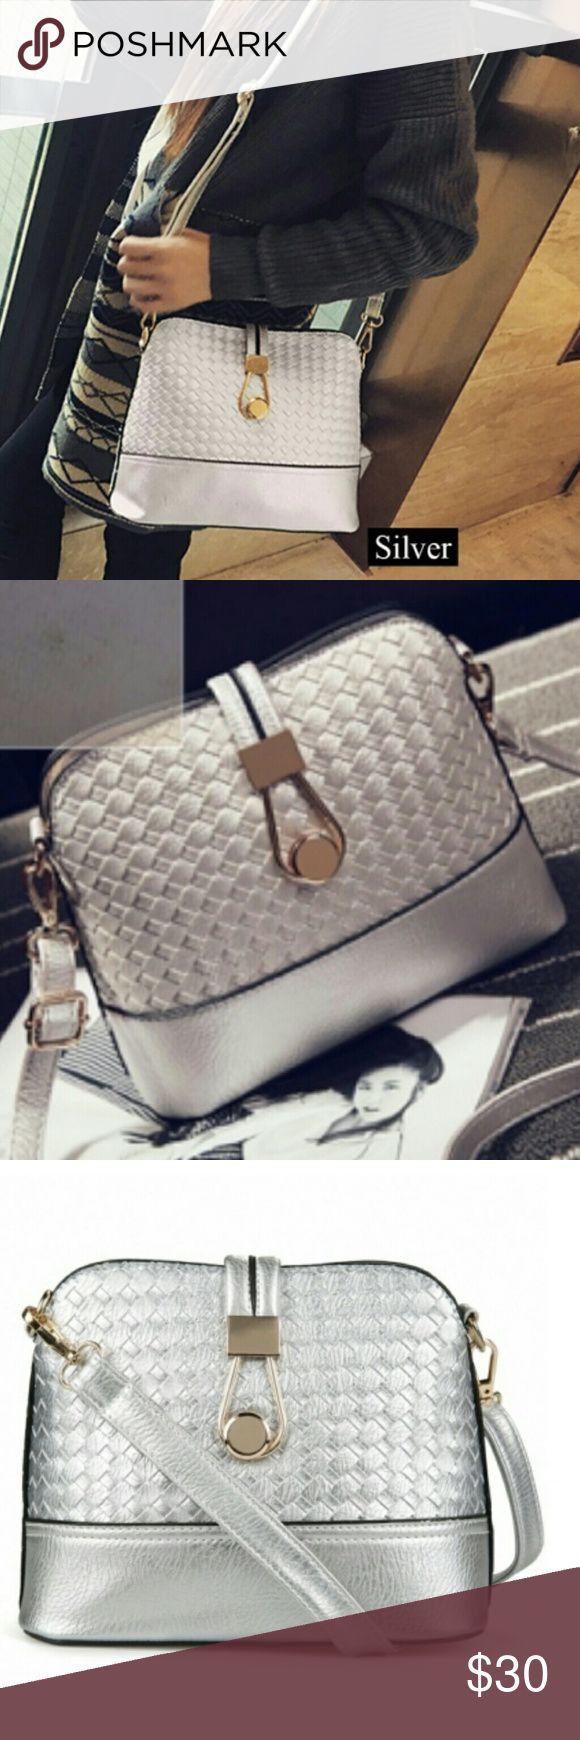 Silver shoulder bag Gorgeous shoulder bag. This bag is great and functional! Bags Shoulder Bags